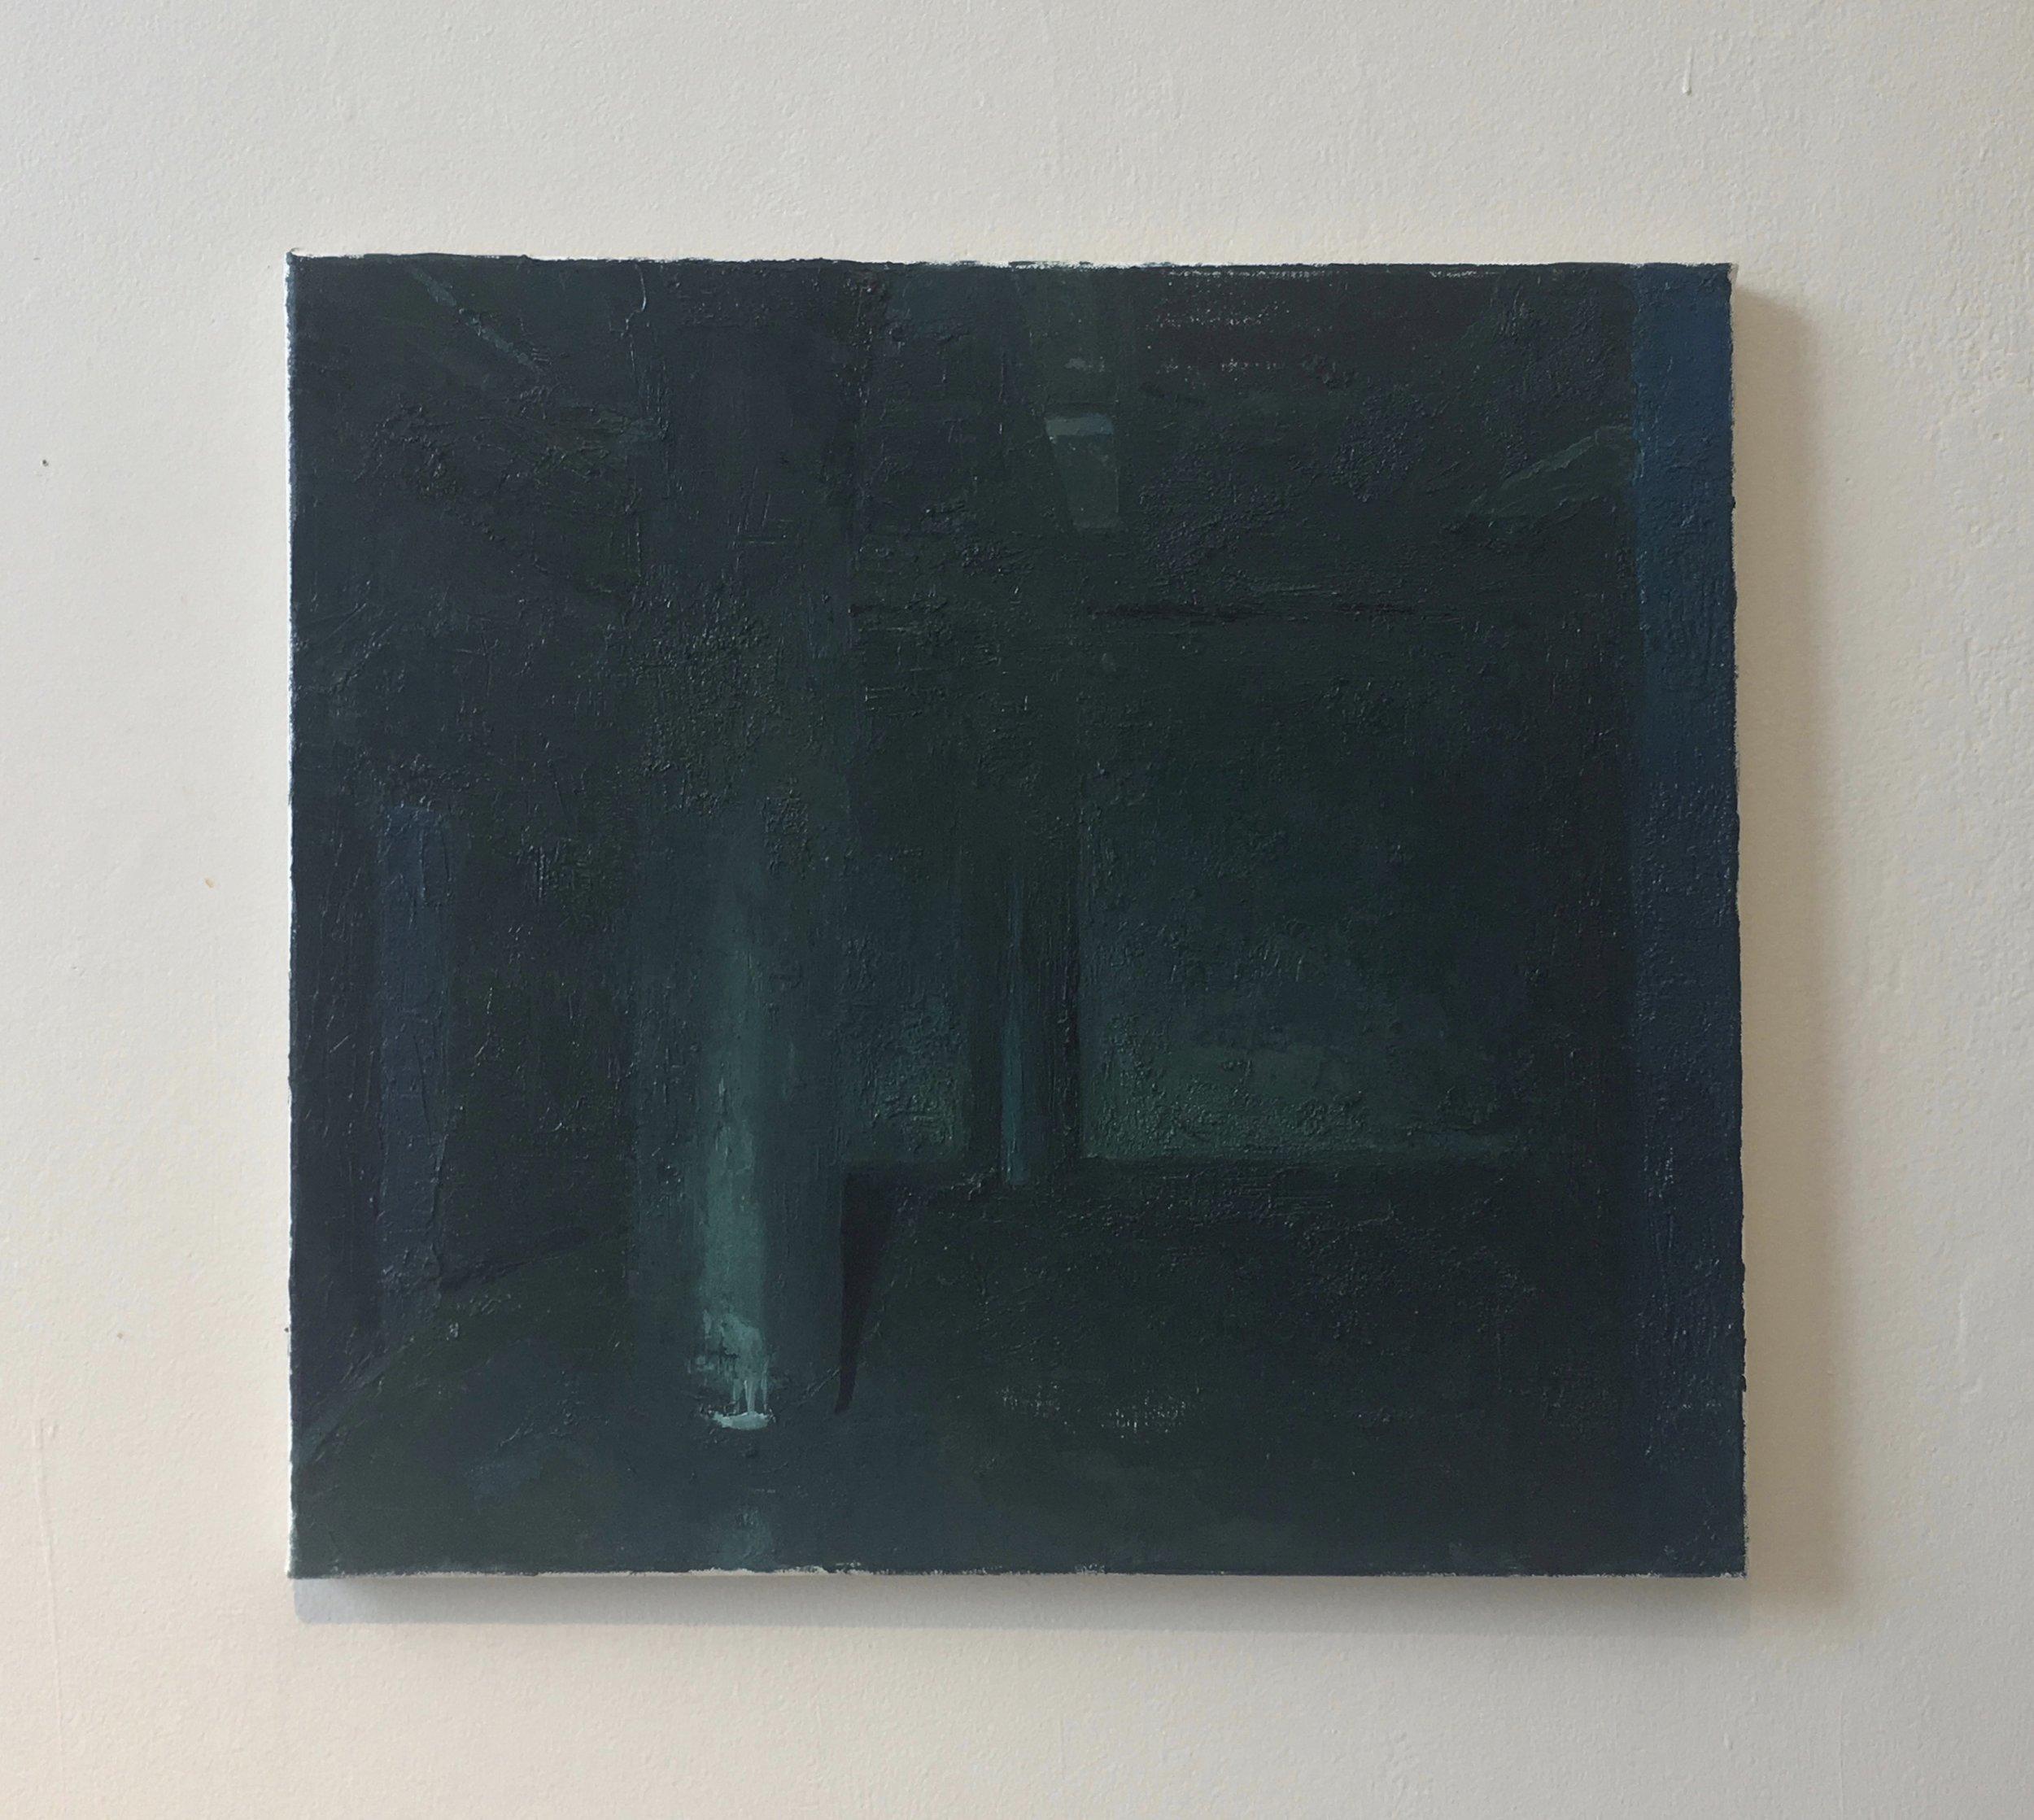 "Block Box Theater, Boston University  - oil on canvas, 18"" x 20"", 2018"